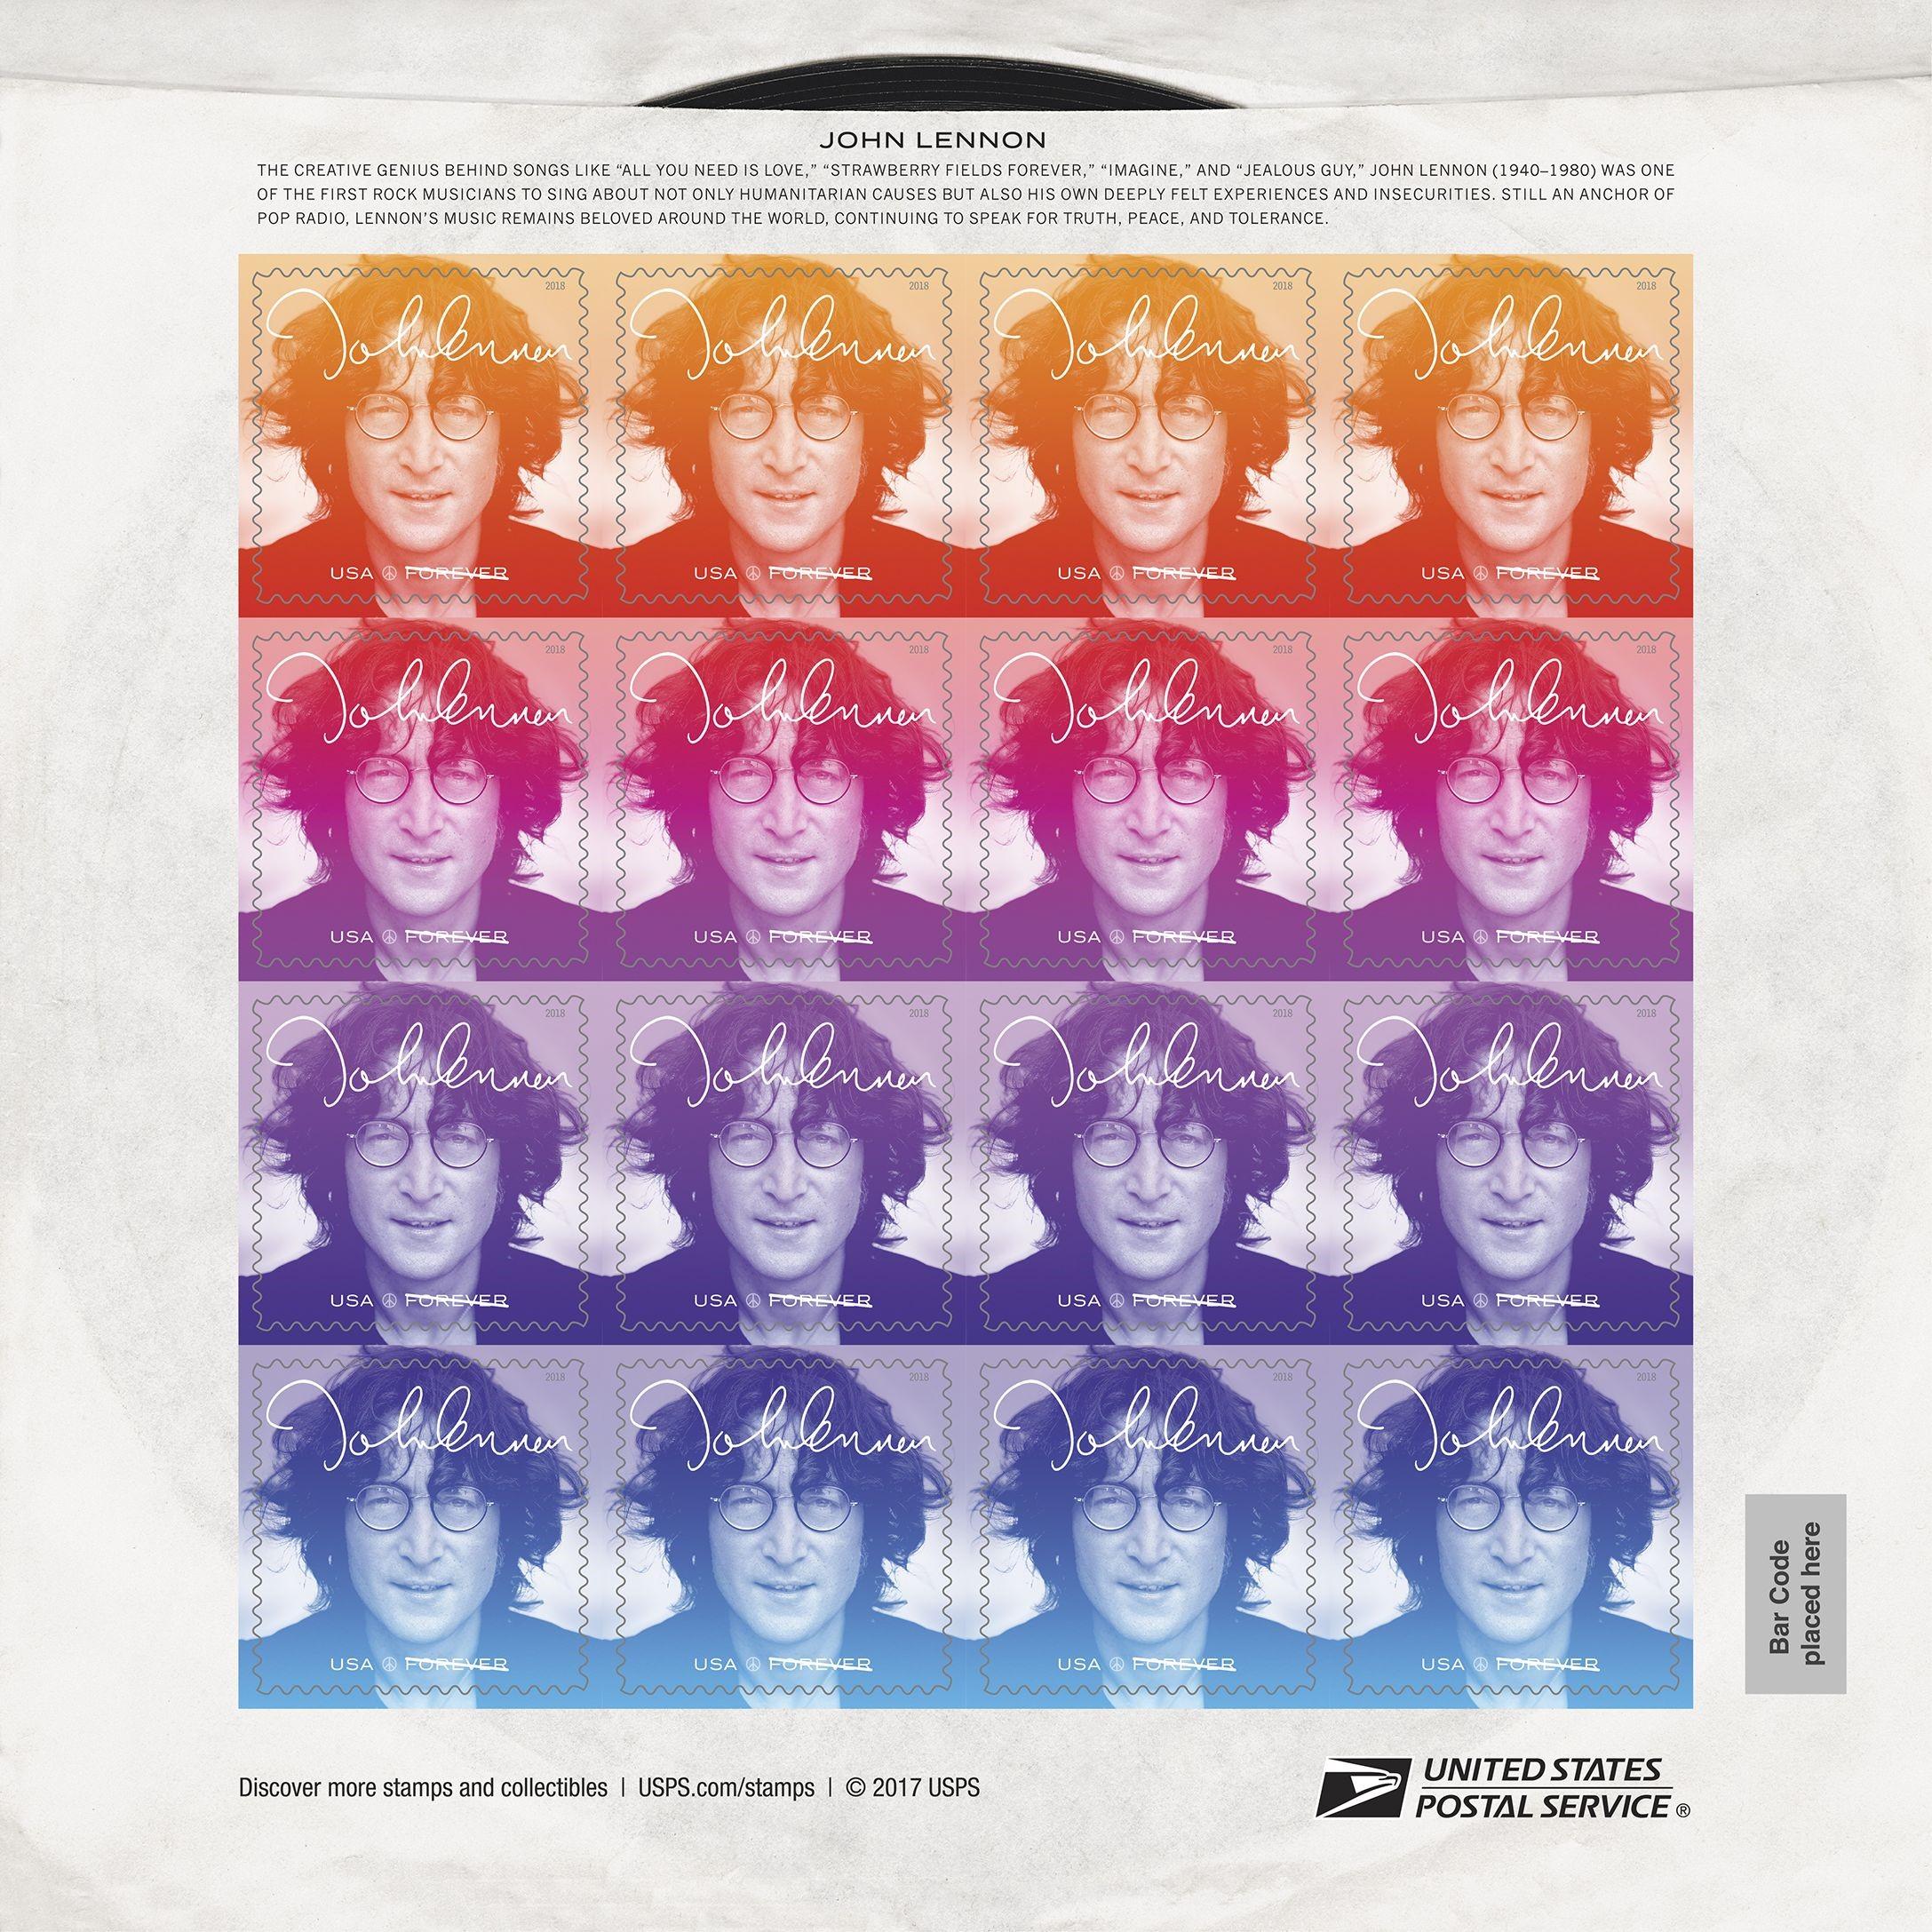 Full pane of 2018 John Lennon stamps from USPS publicity image